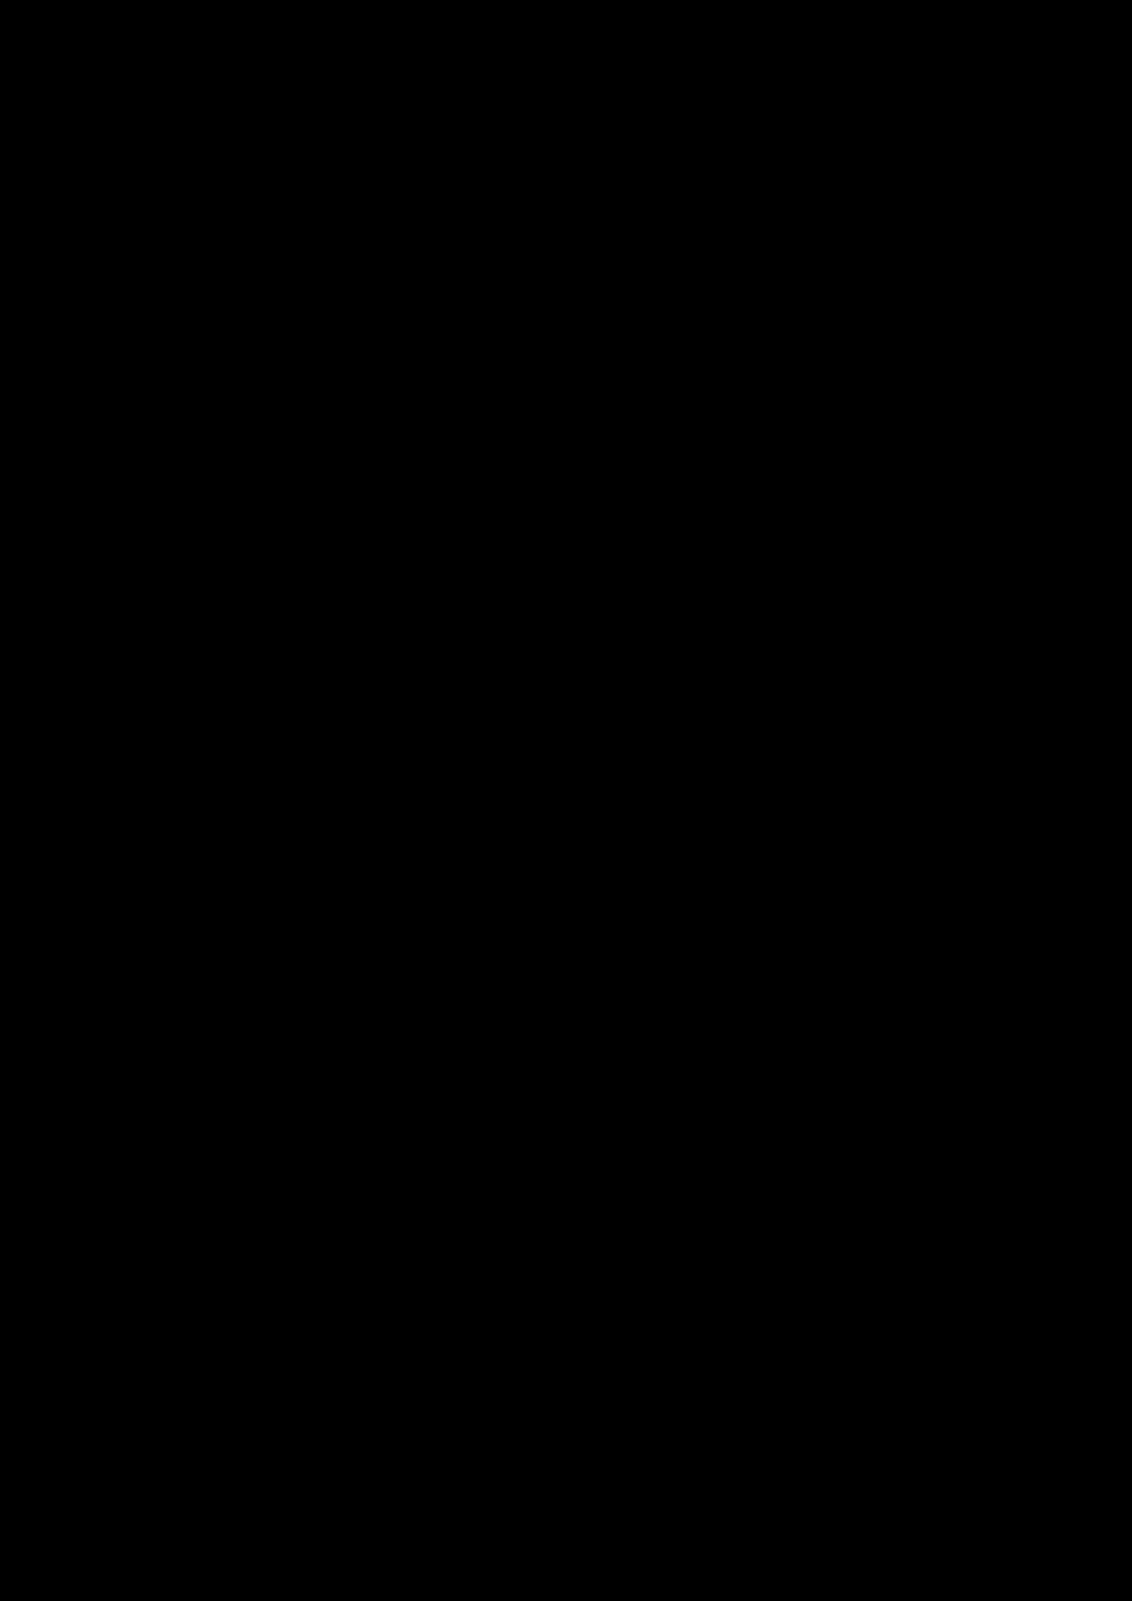 Korolevstvo slez slide, Image 19